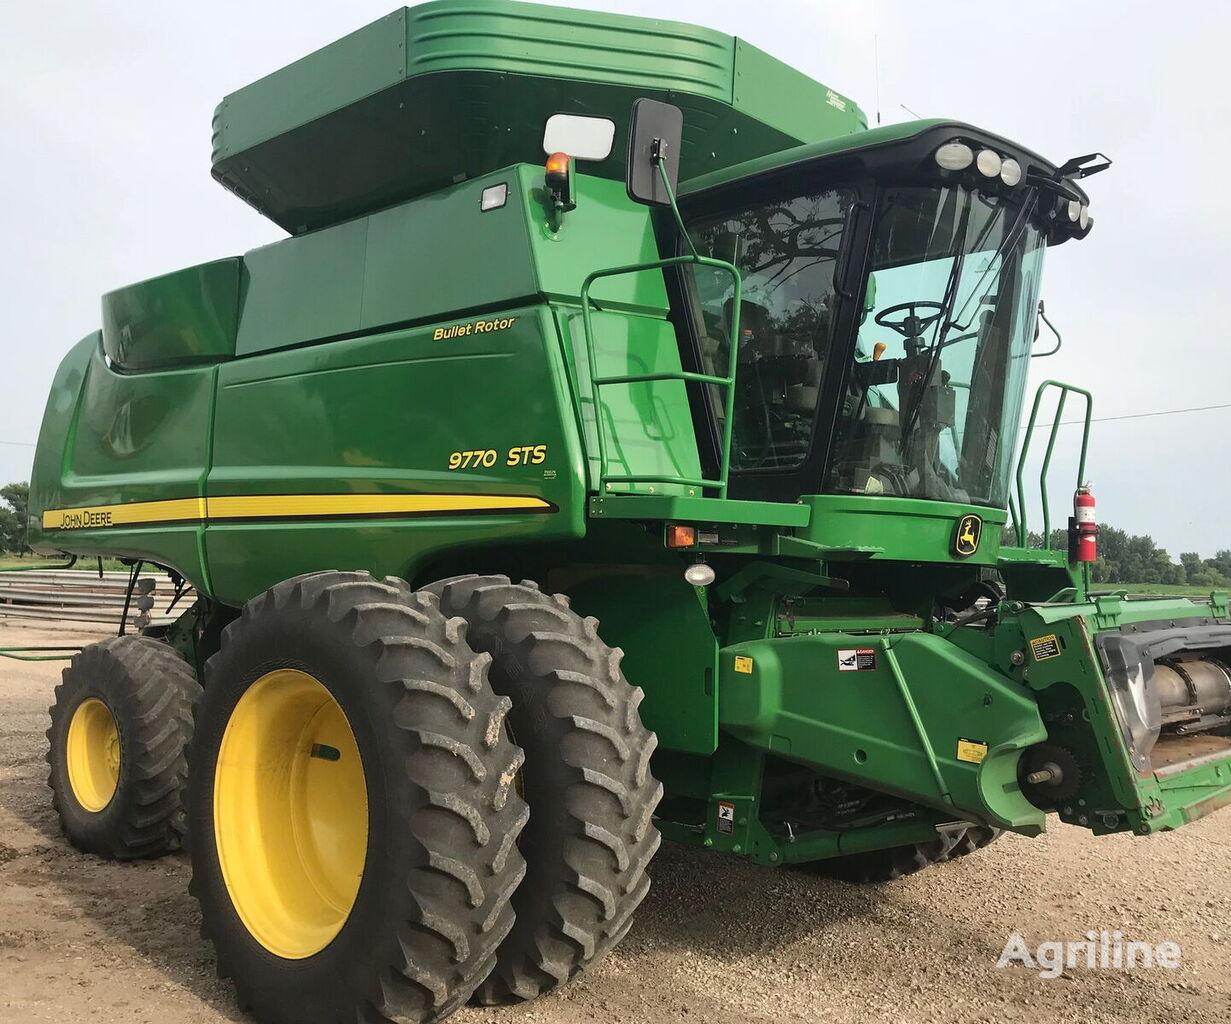 JOHN DEERE 9770 STS (mozhliviy lizing) cosechadora de cereales